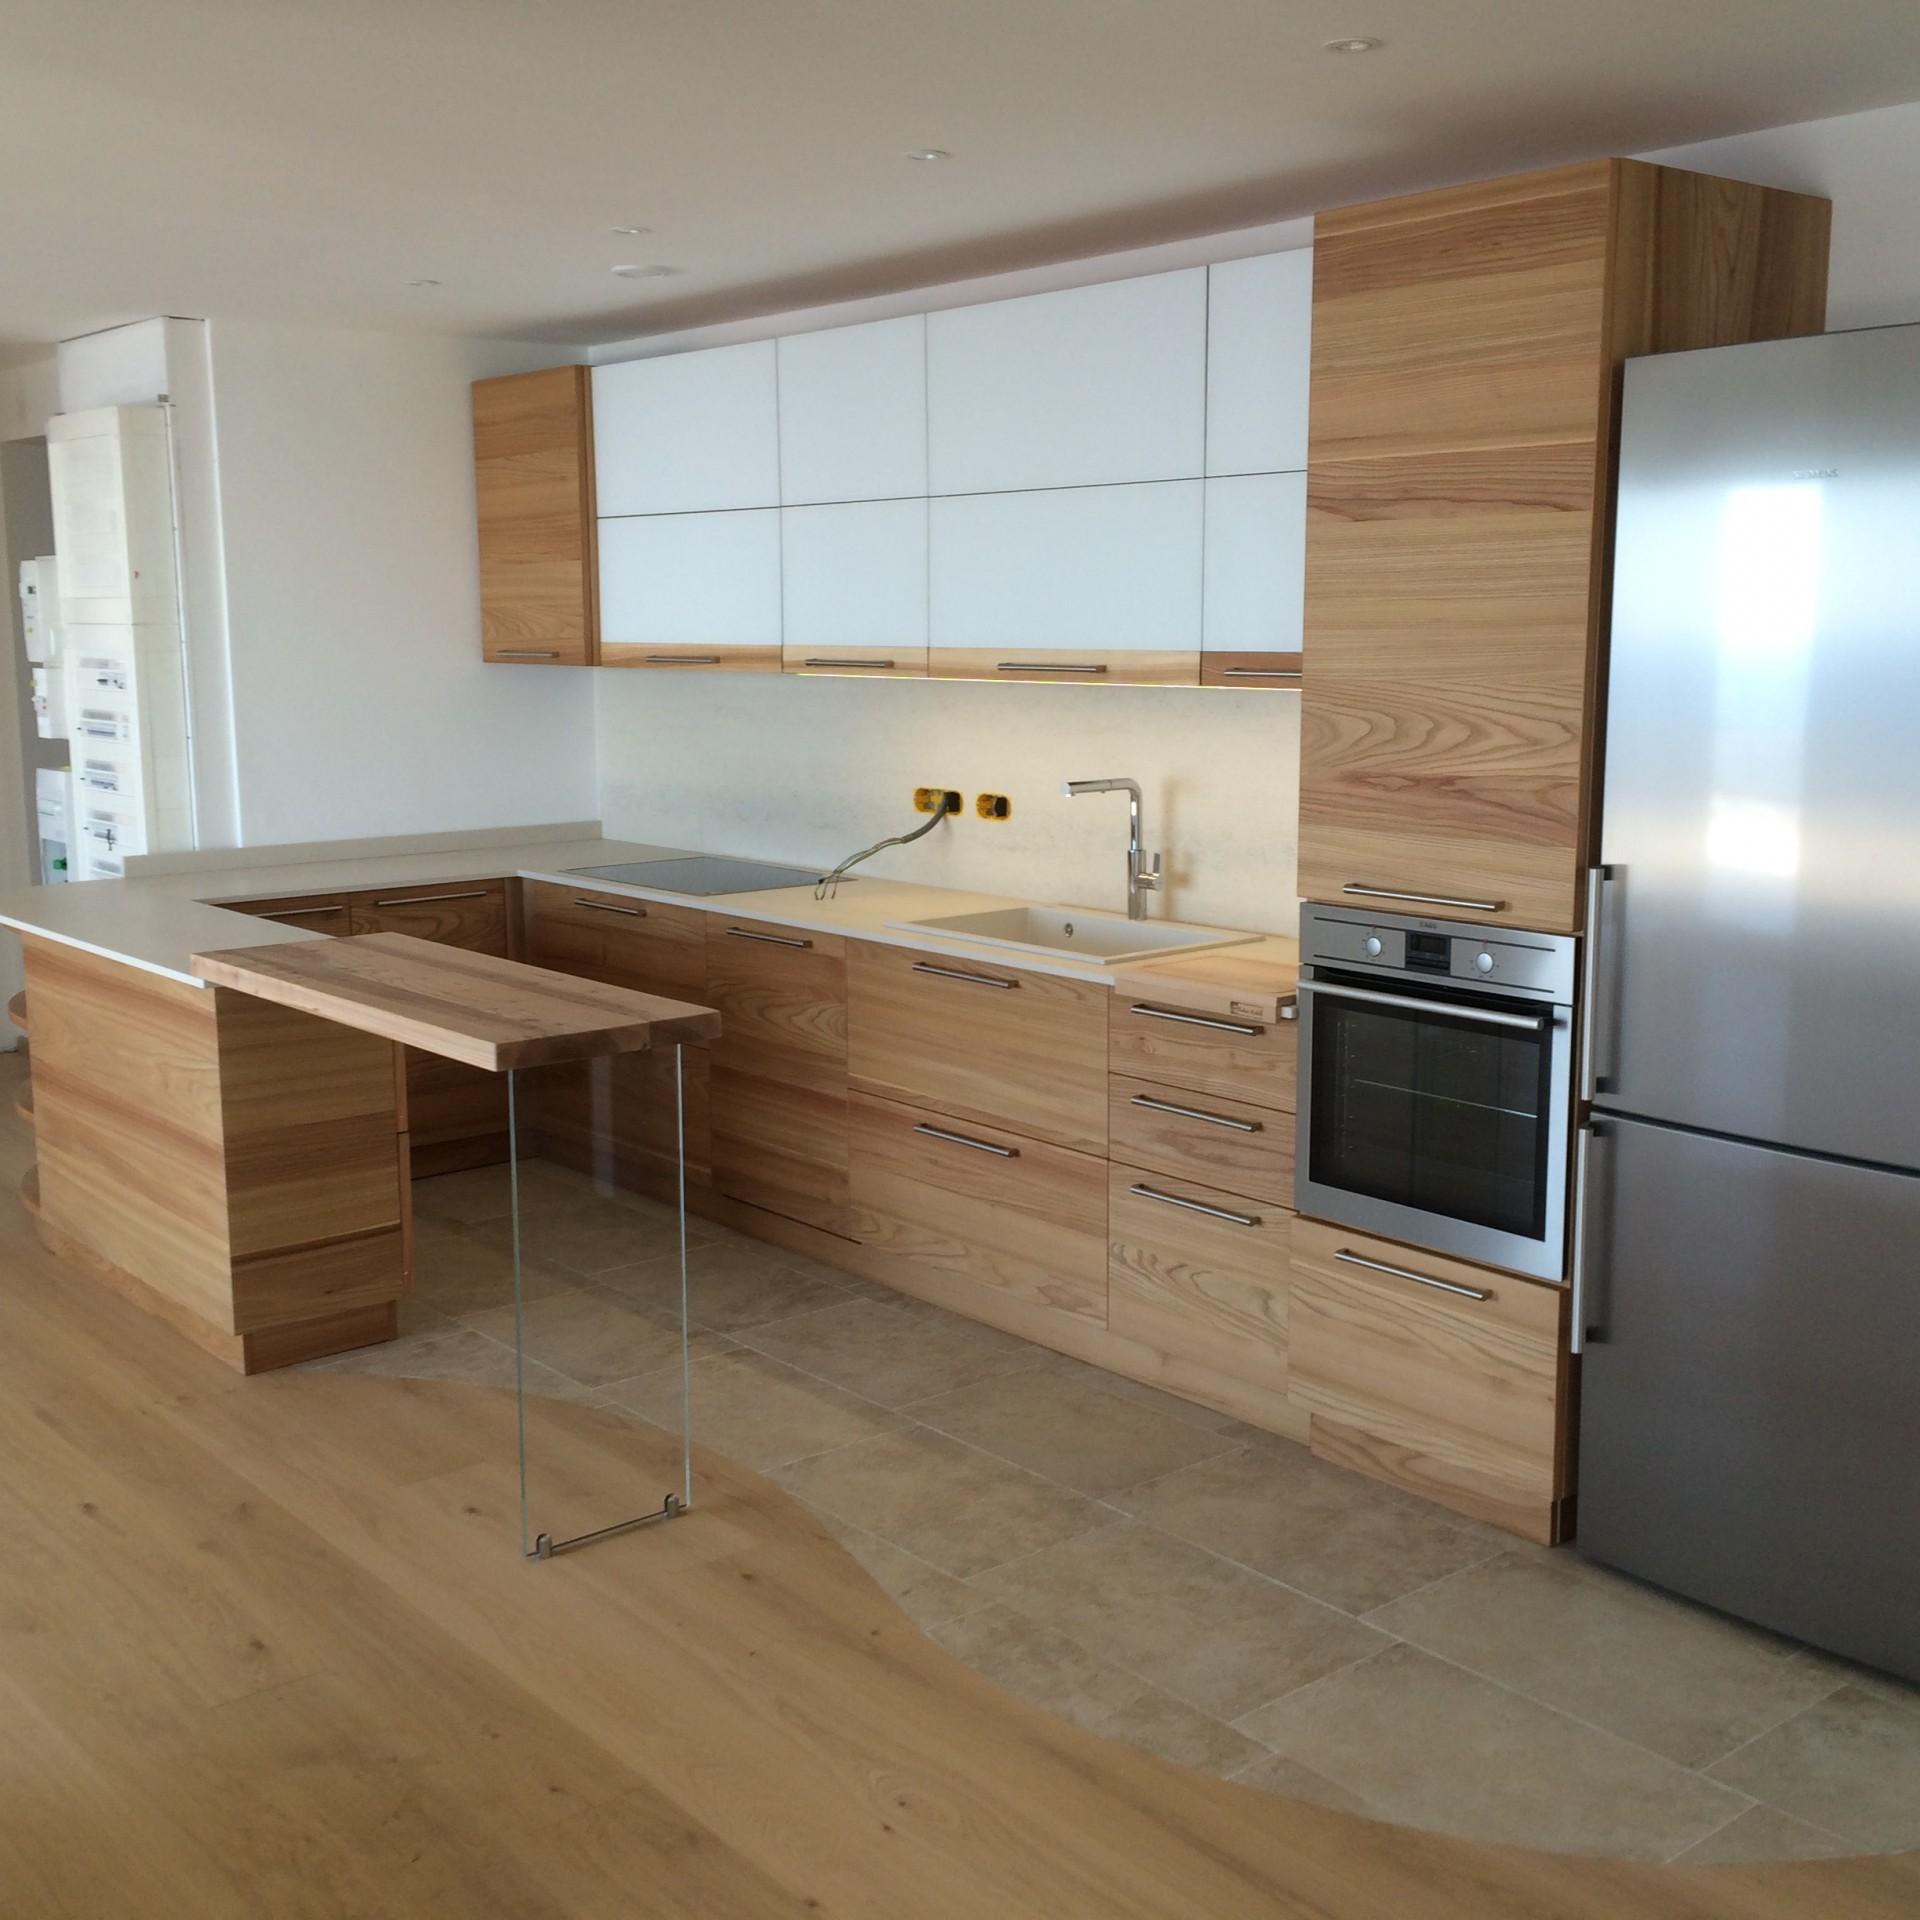 Cucine moderne artigianali in legno fadini mobili cerea verona - Mobili cucina moderna ...